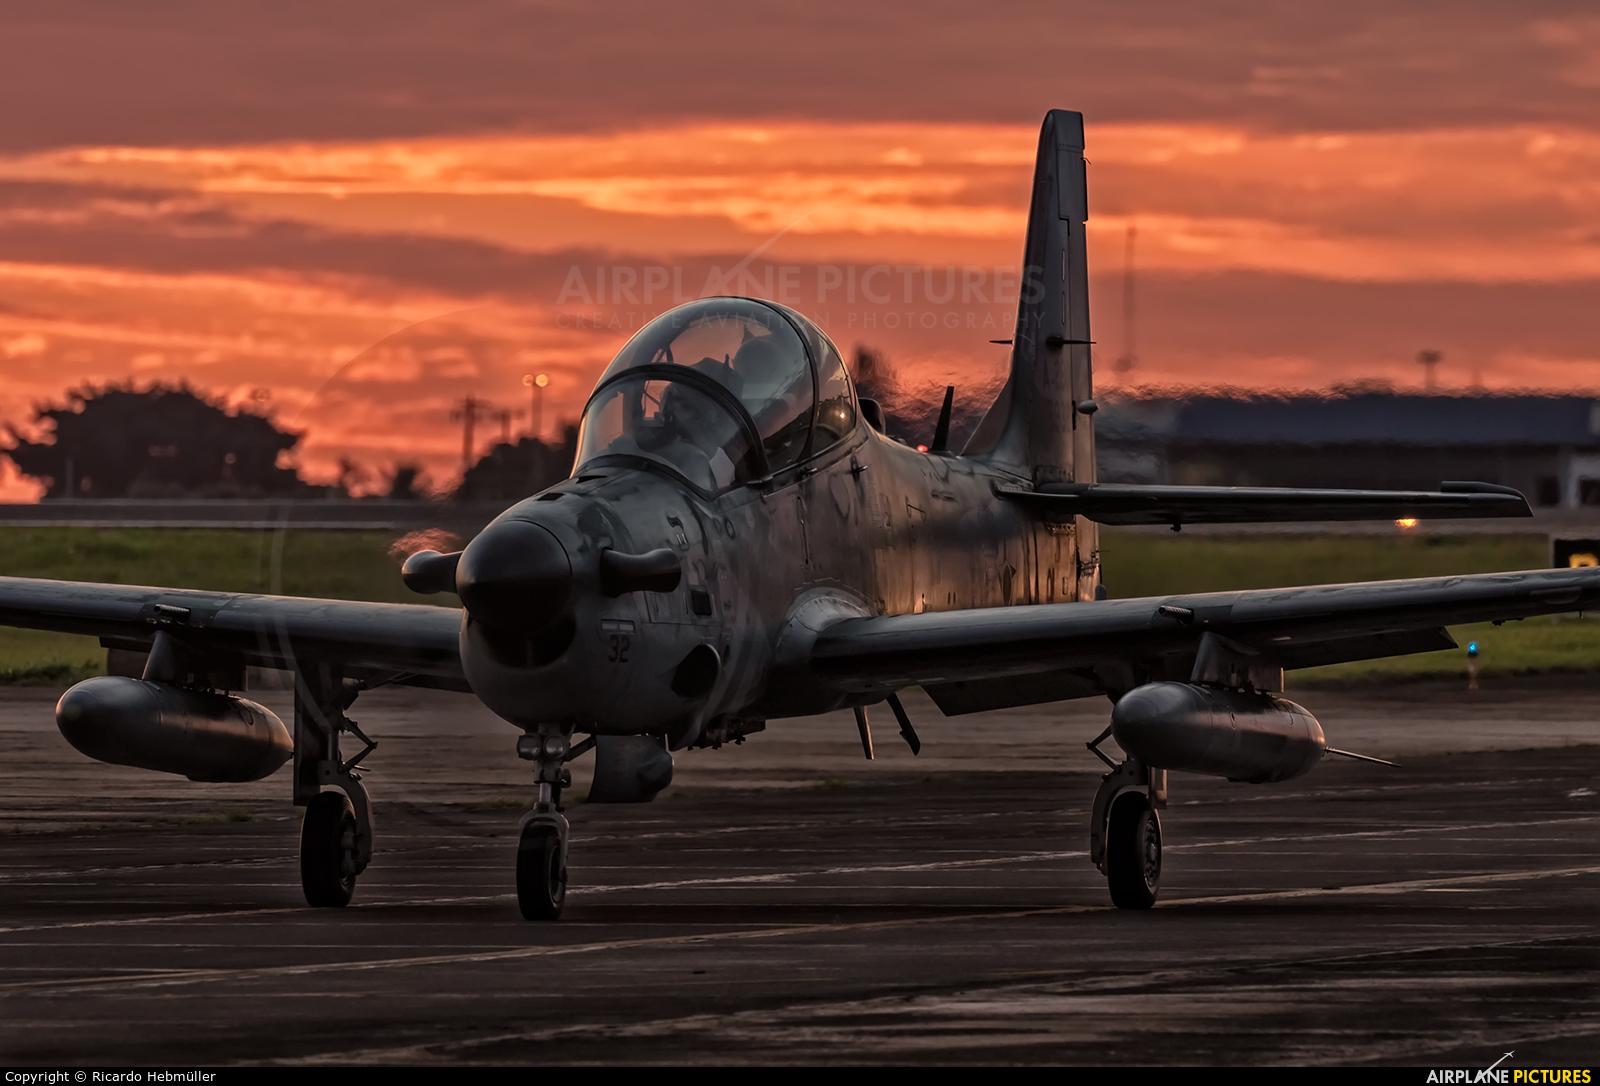 Brazil - Air Force 5932 aircraft at Campo Grande